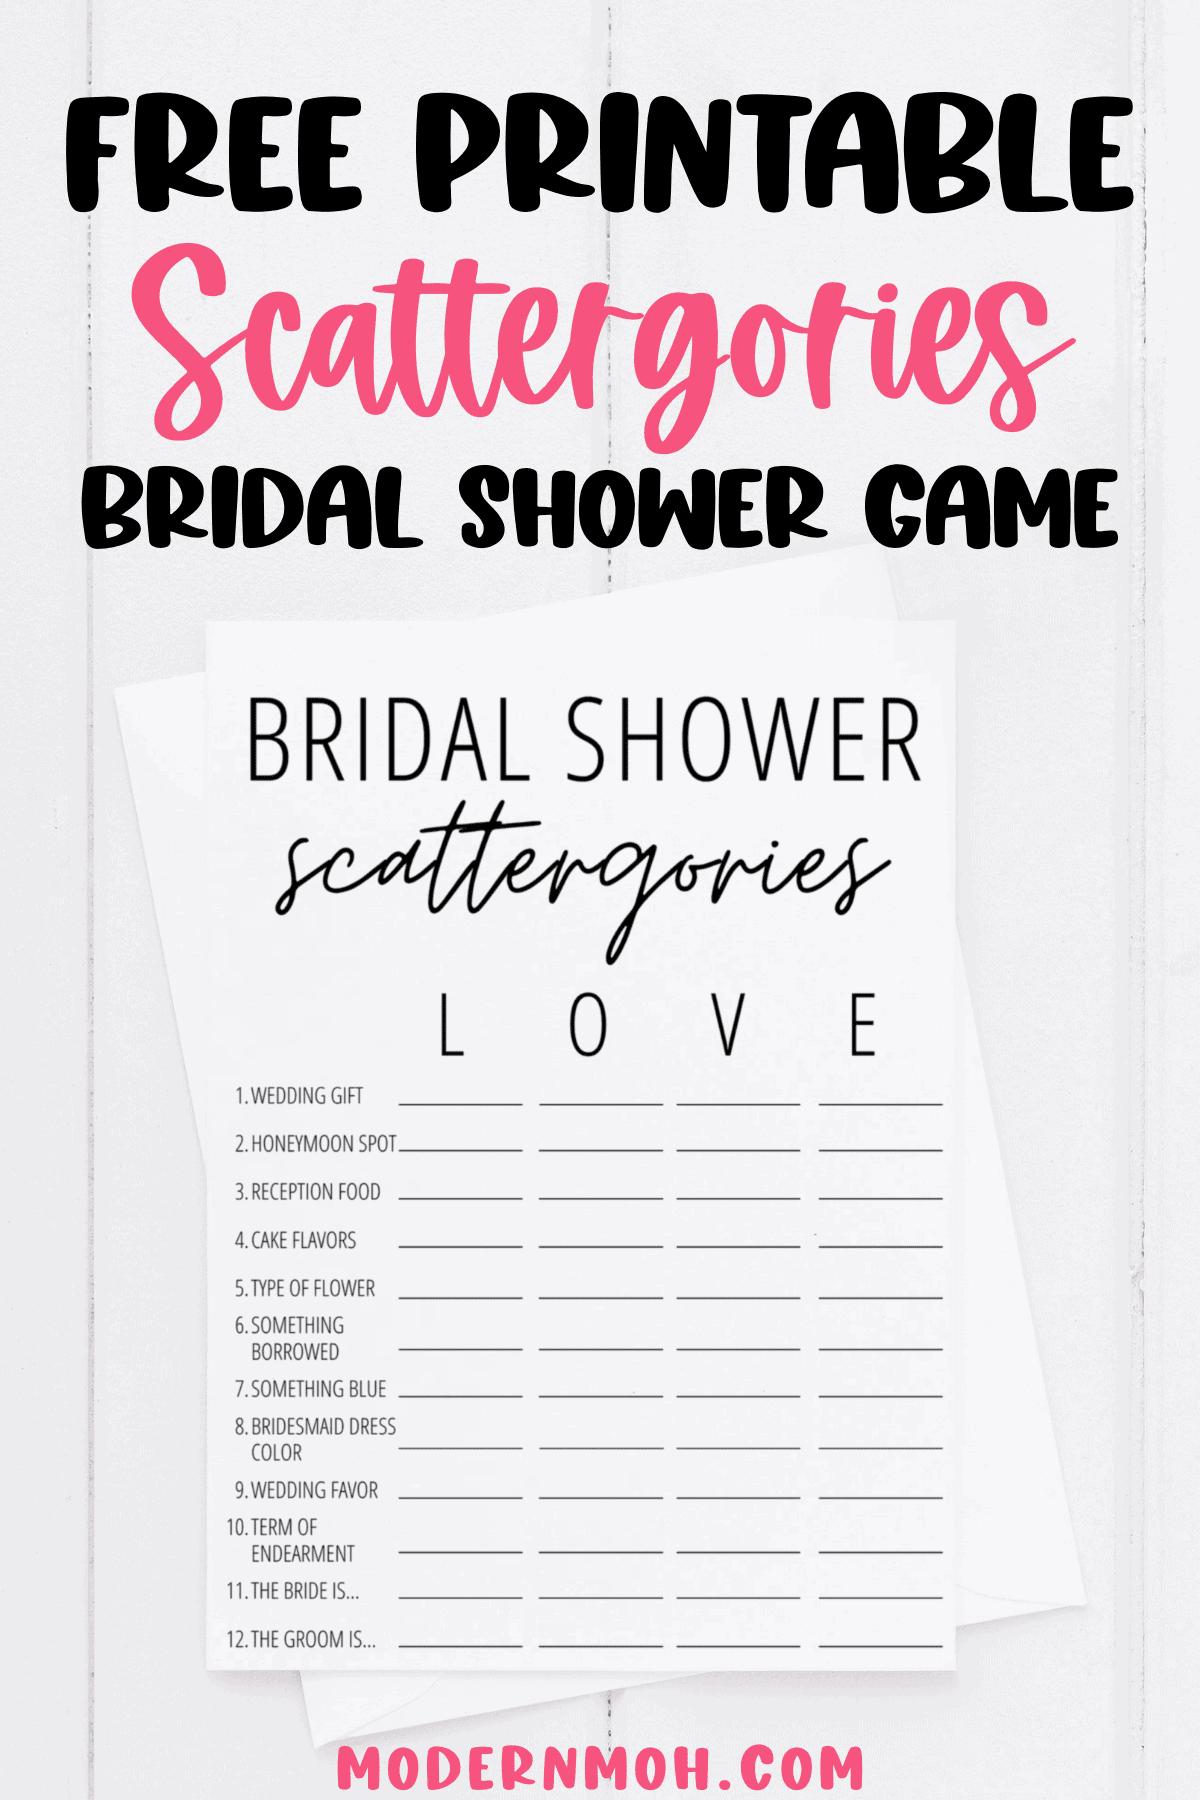 Bridal Shower Scattergories Free Printable